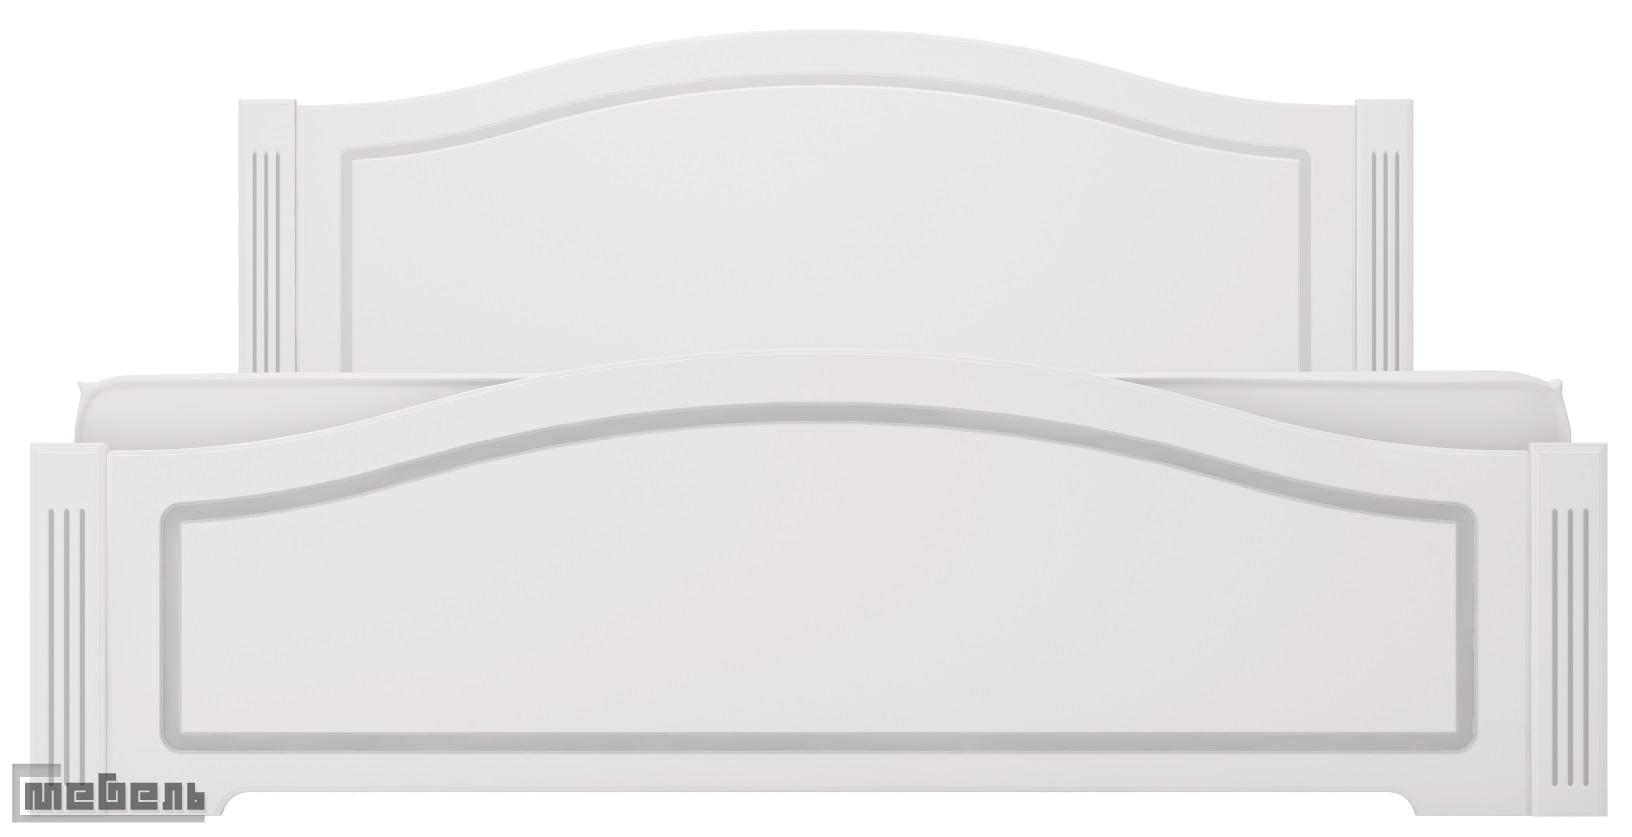 "Кровать 33 (1200 x 2000 мм.) с латами, без матраса спальня ""Виктория"""